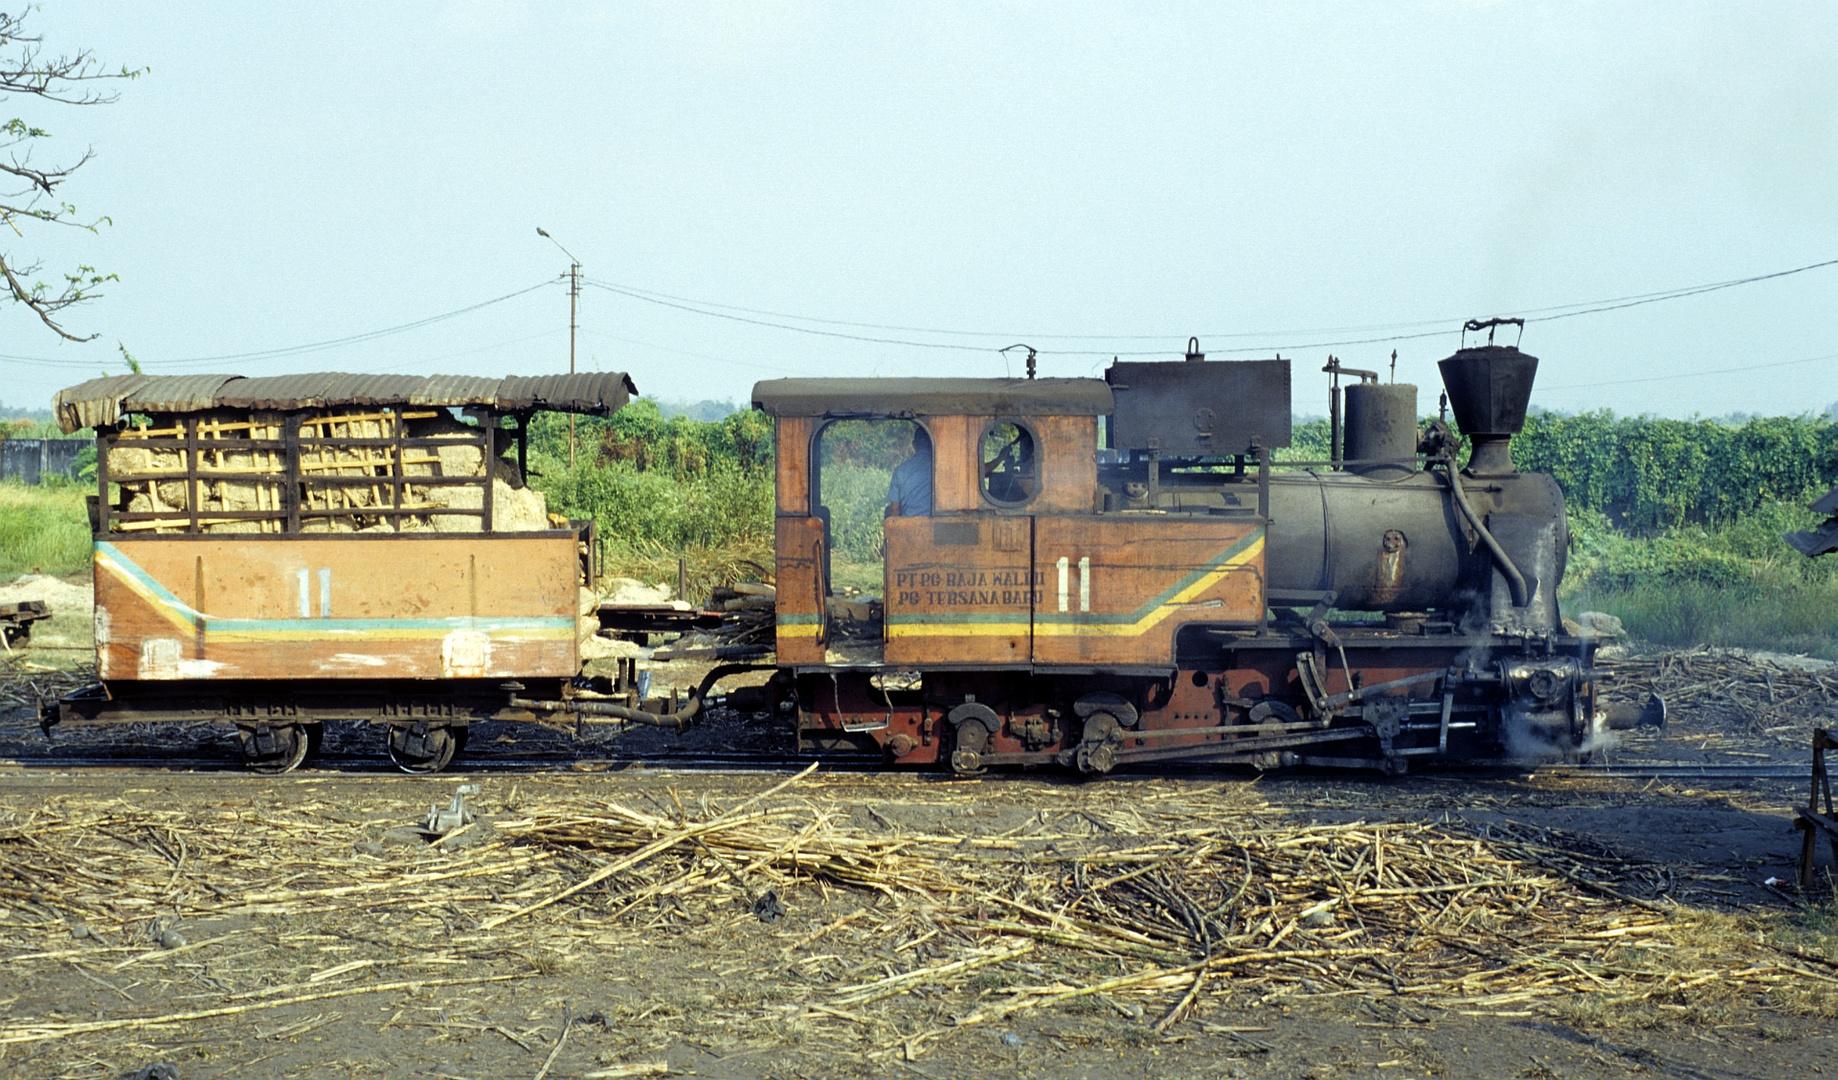 Zuckerfabrik PG Tersana Baru, Losari (Java, Indonesien), Juli 2002